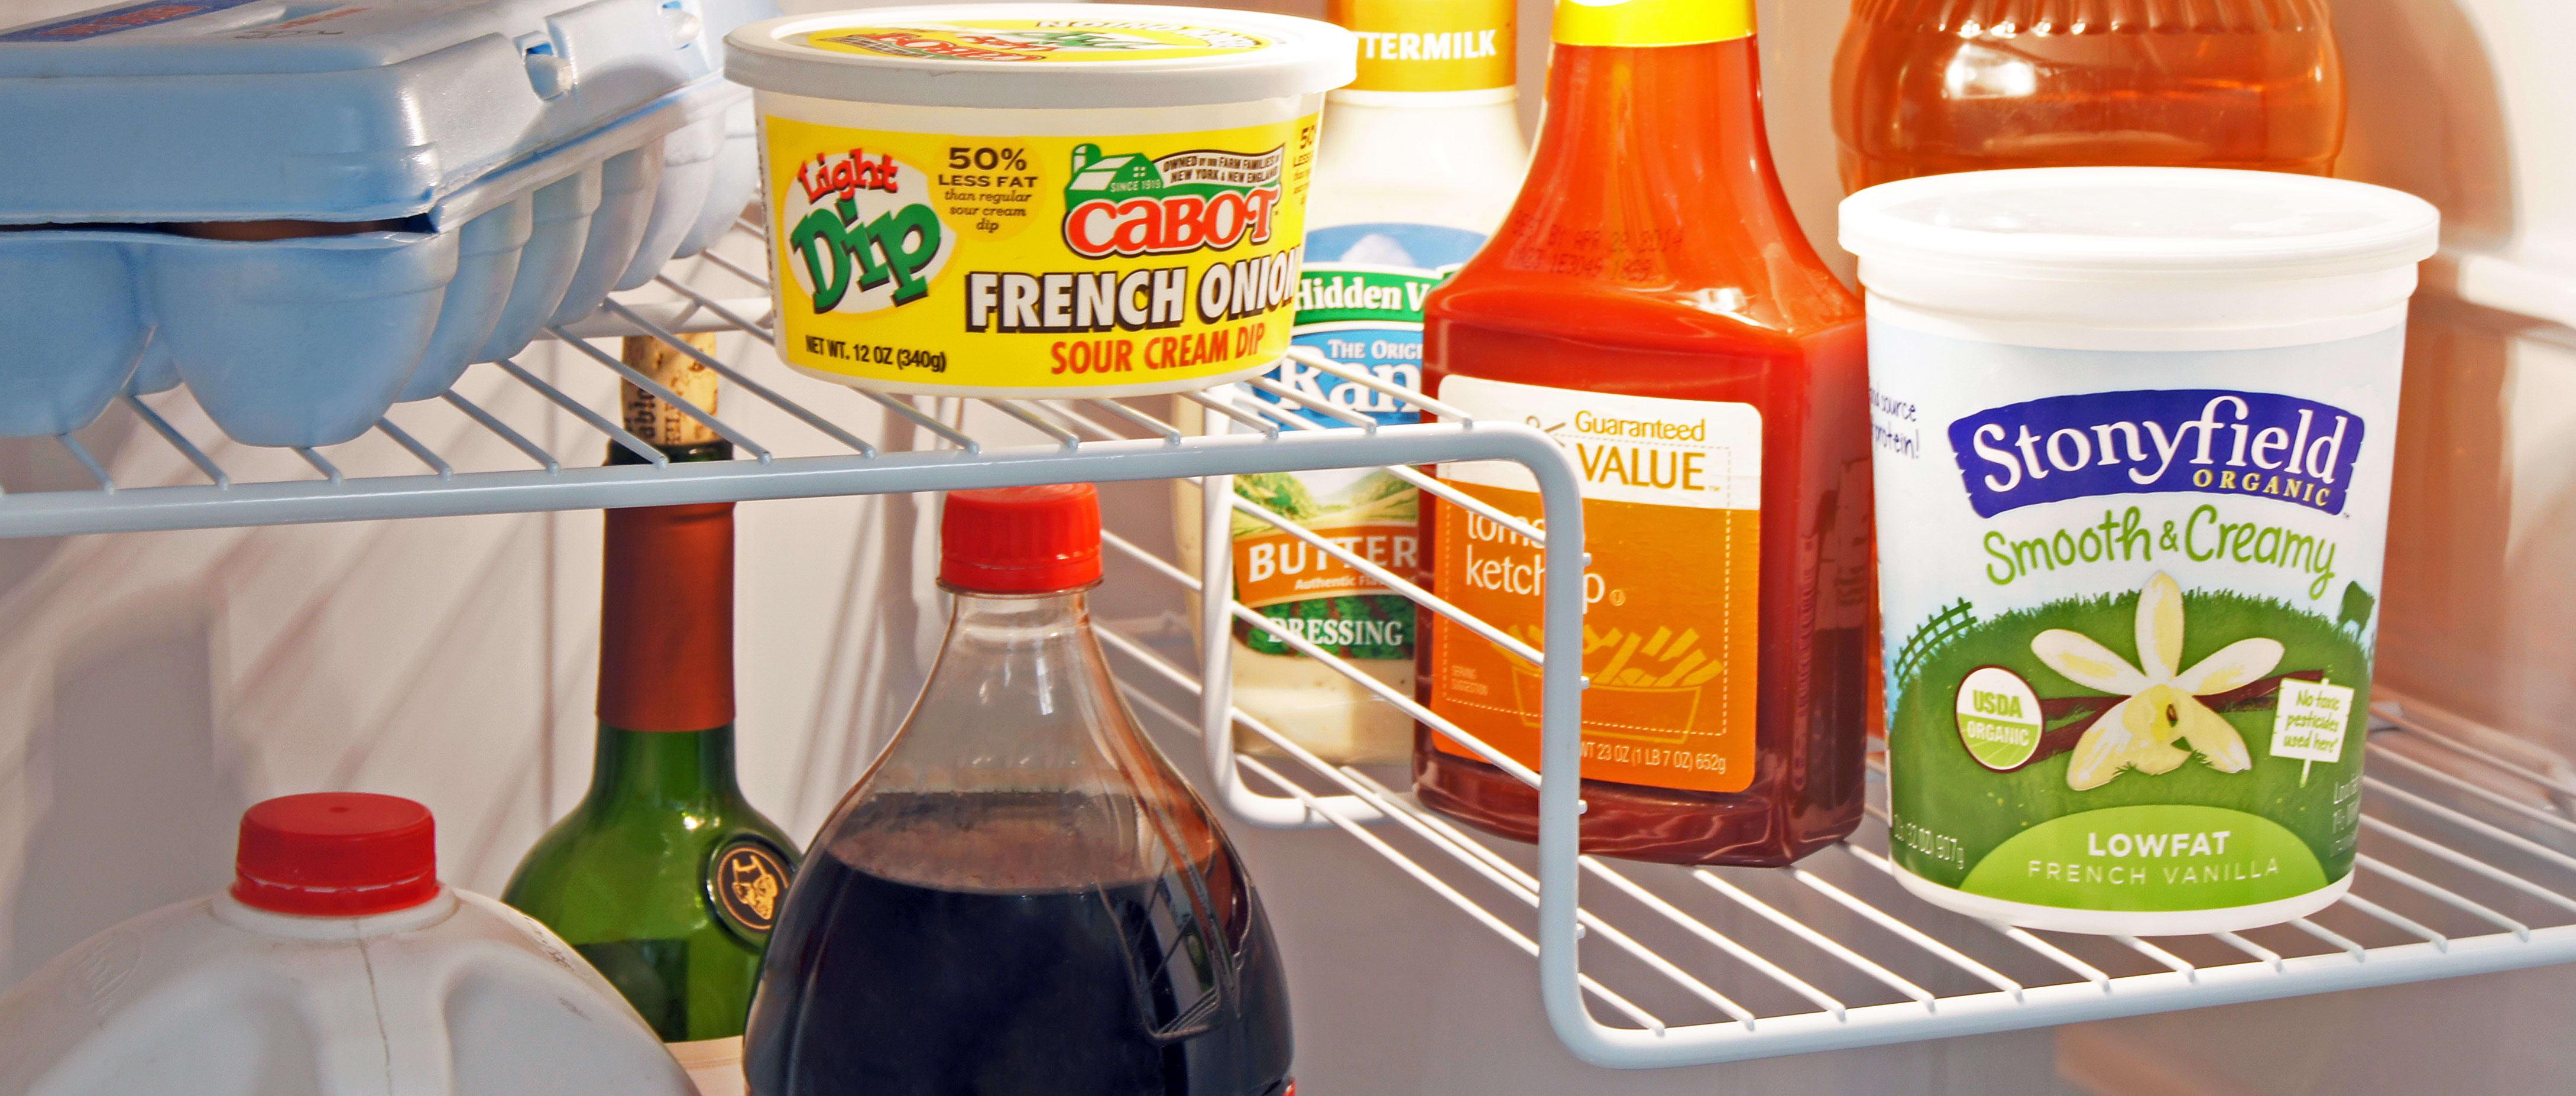 GE GIE16DGHBB Black Top Freezer Refrigerator